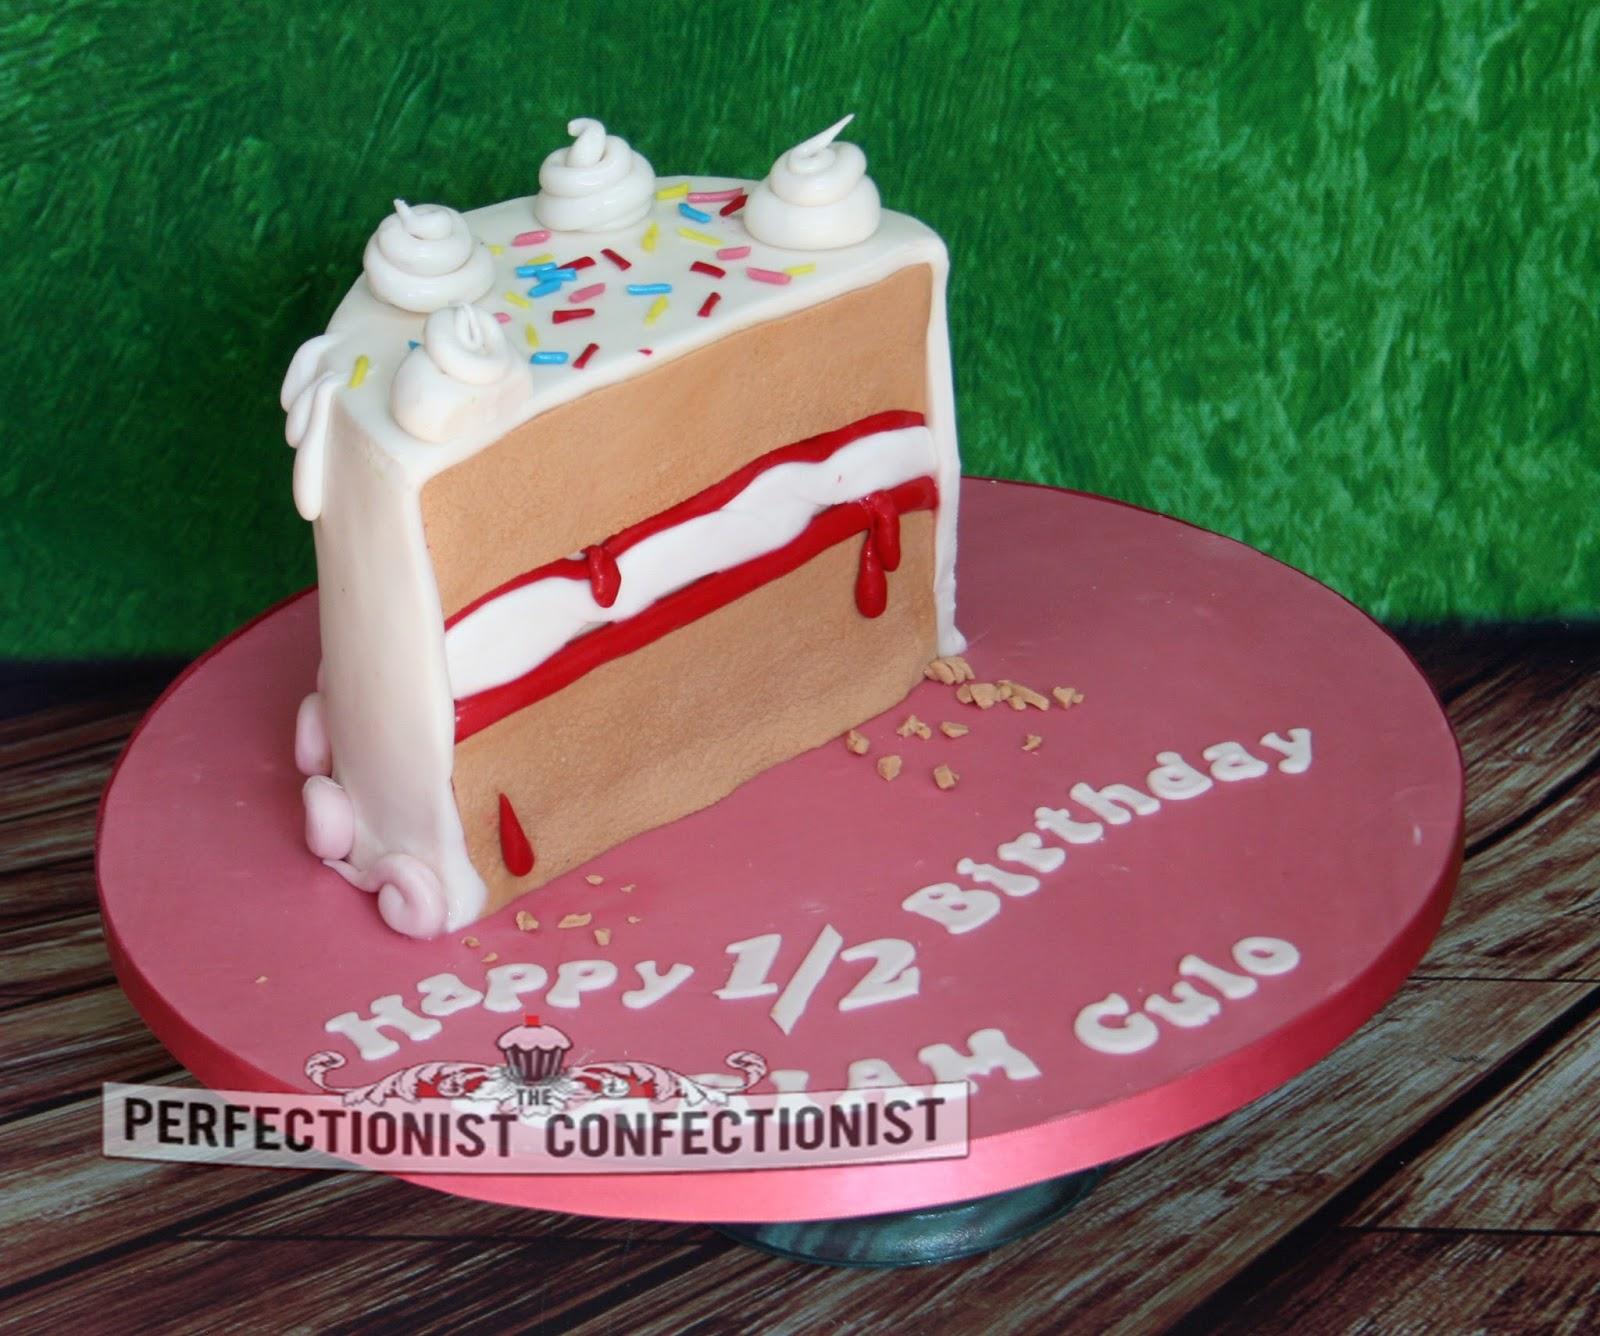 The Perfectionist Confectionist Mariam Half Birthday Cake